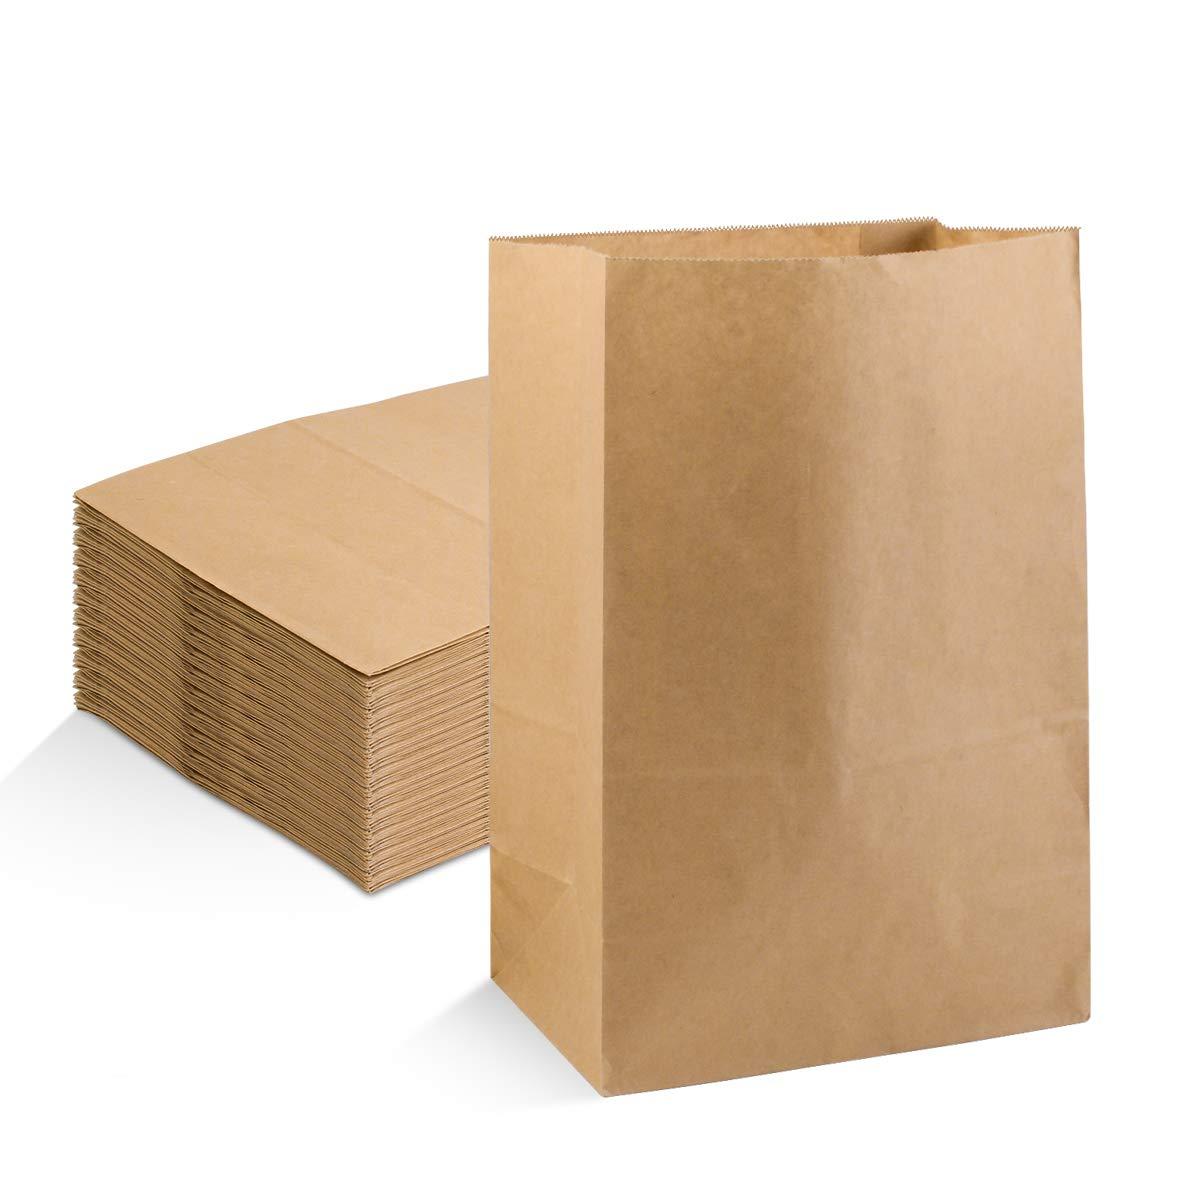 LadyRosian 100 Pack Small Brown Paper Bags (12